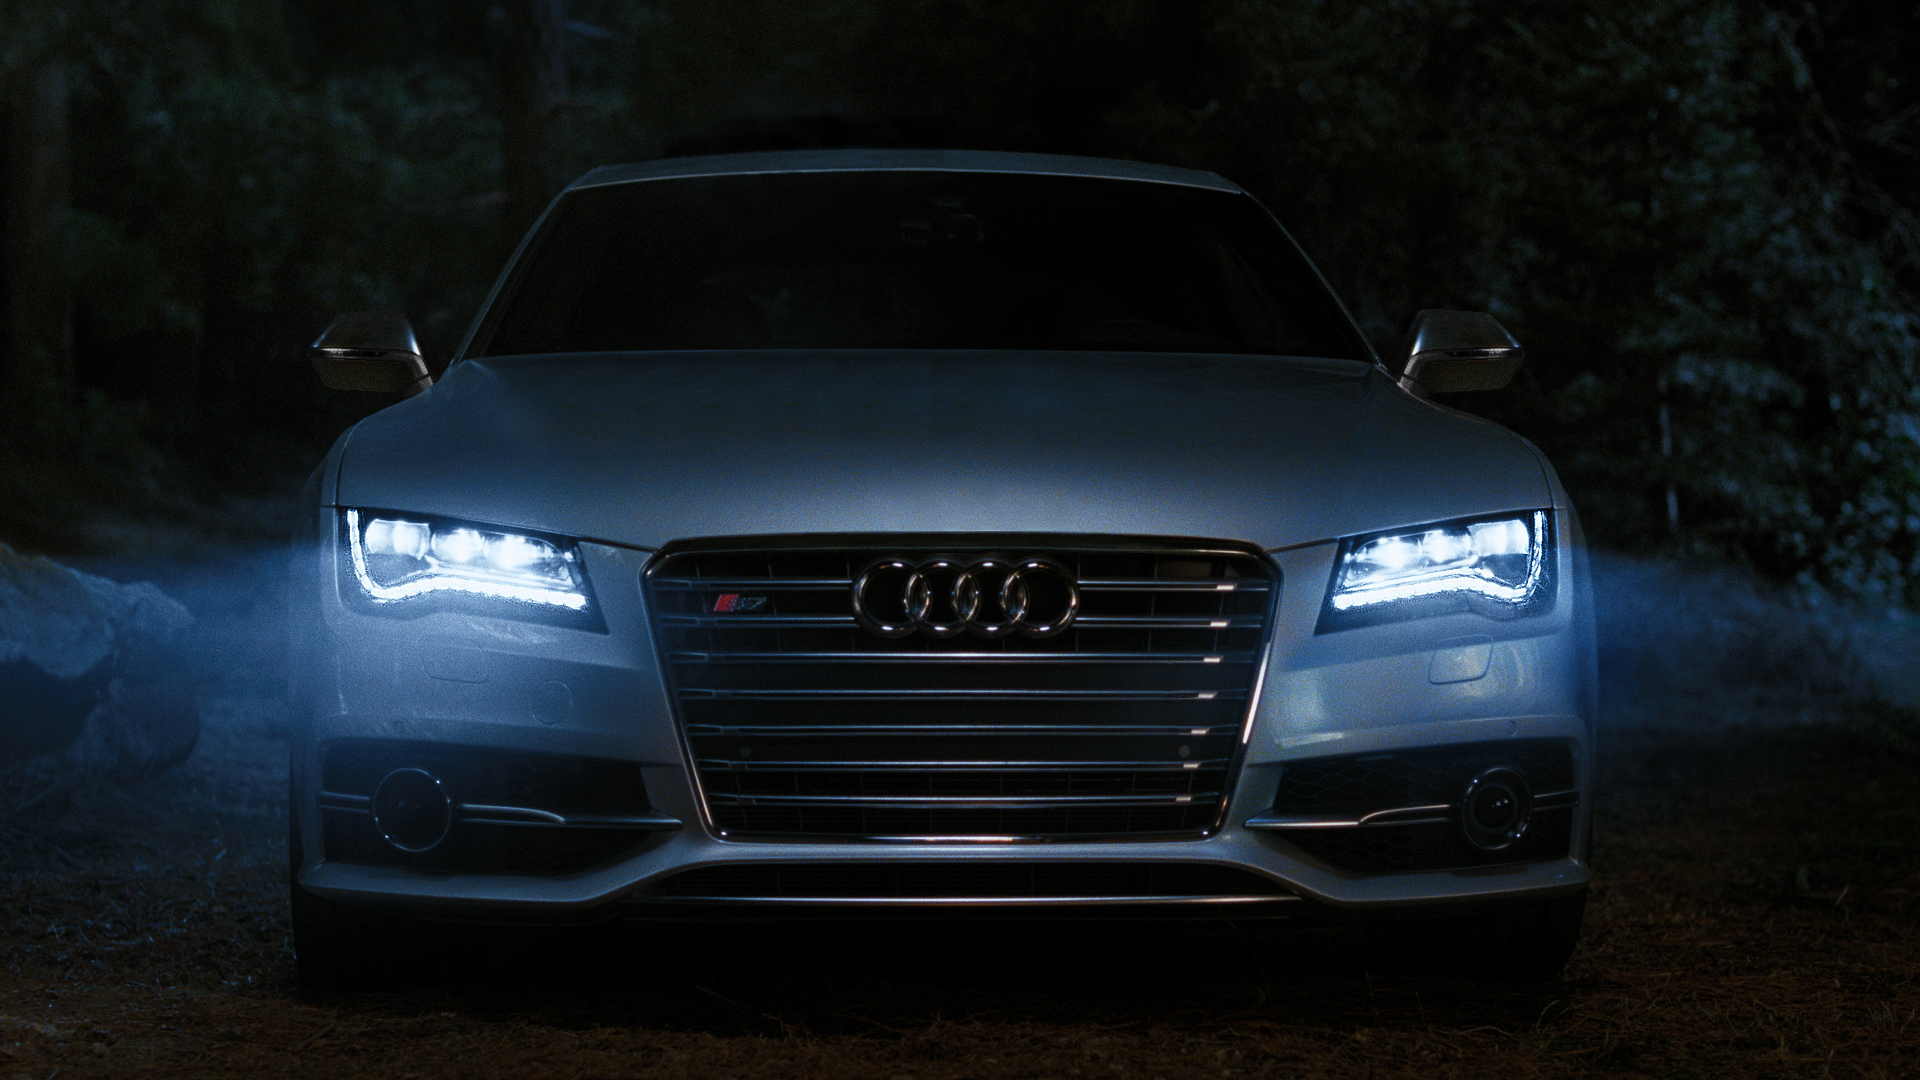 Audi's signature LEDs on the 2013 S7